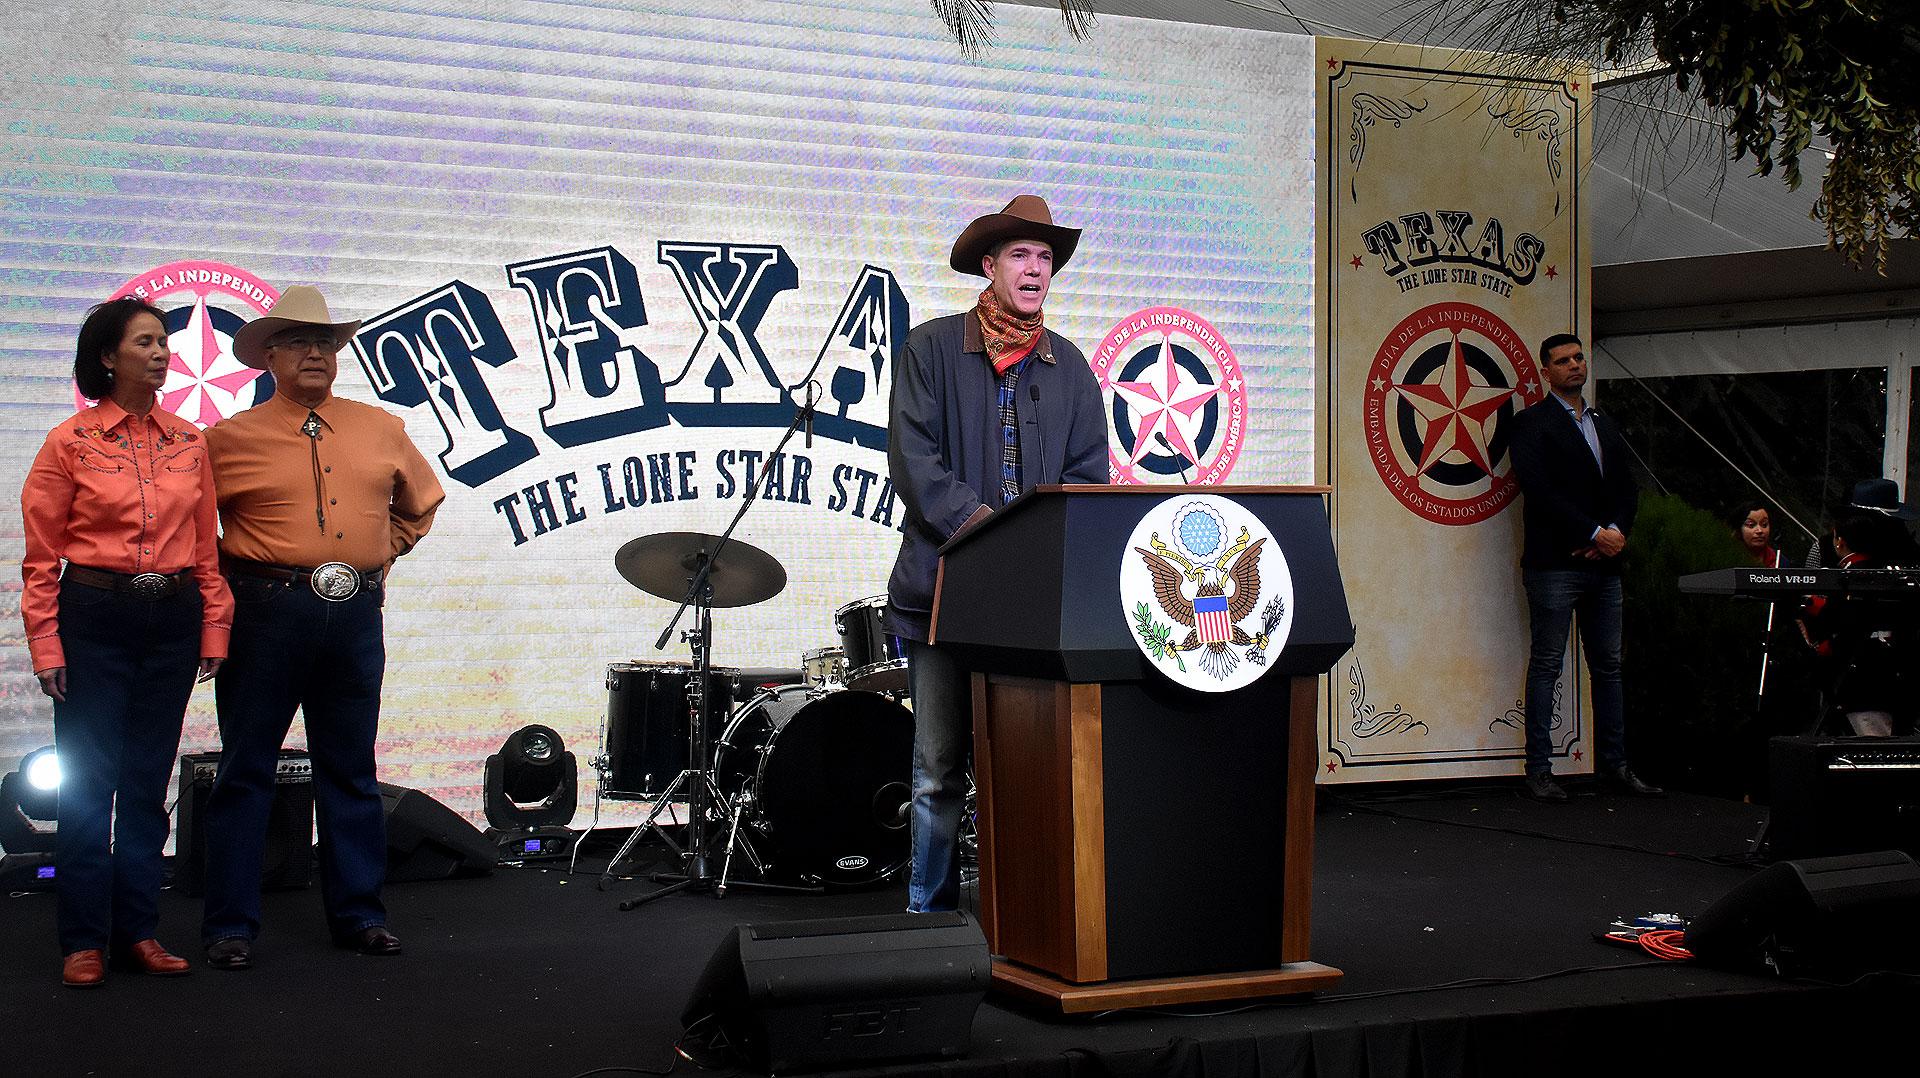 Mark Leoni, cónsul general, brindó un breve discurso de bienvenida